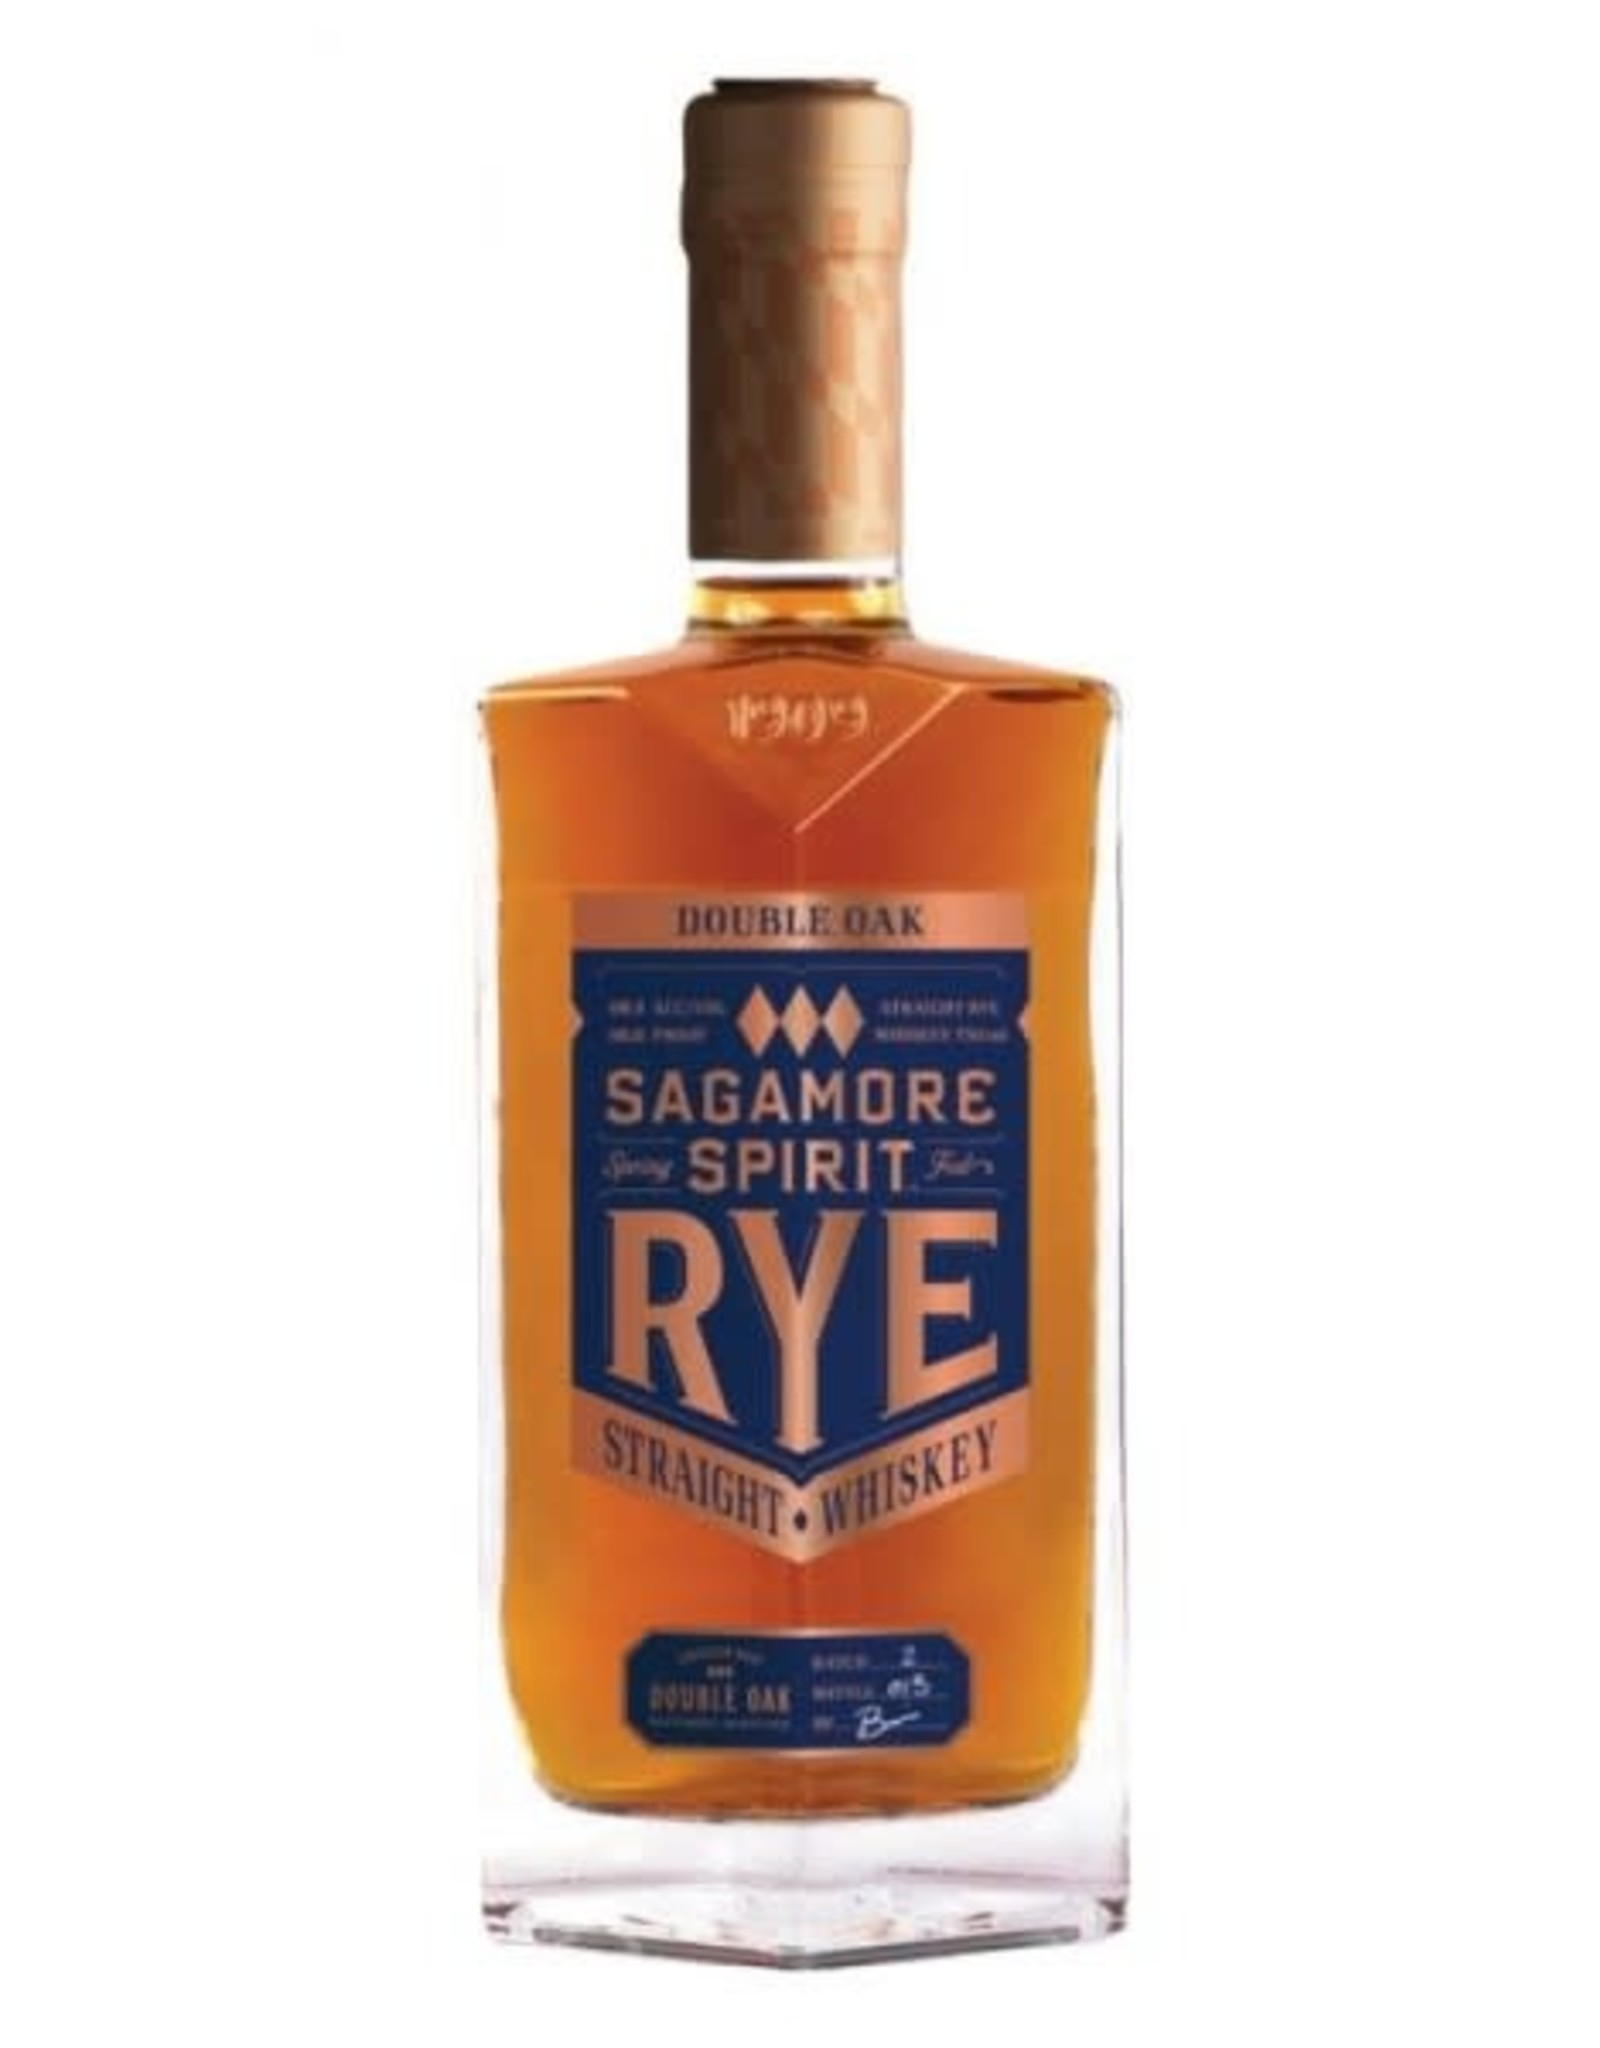 Sagamore Spirit Reserve Double Oak Straight Rye